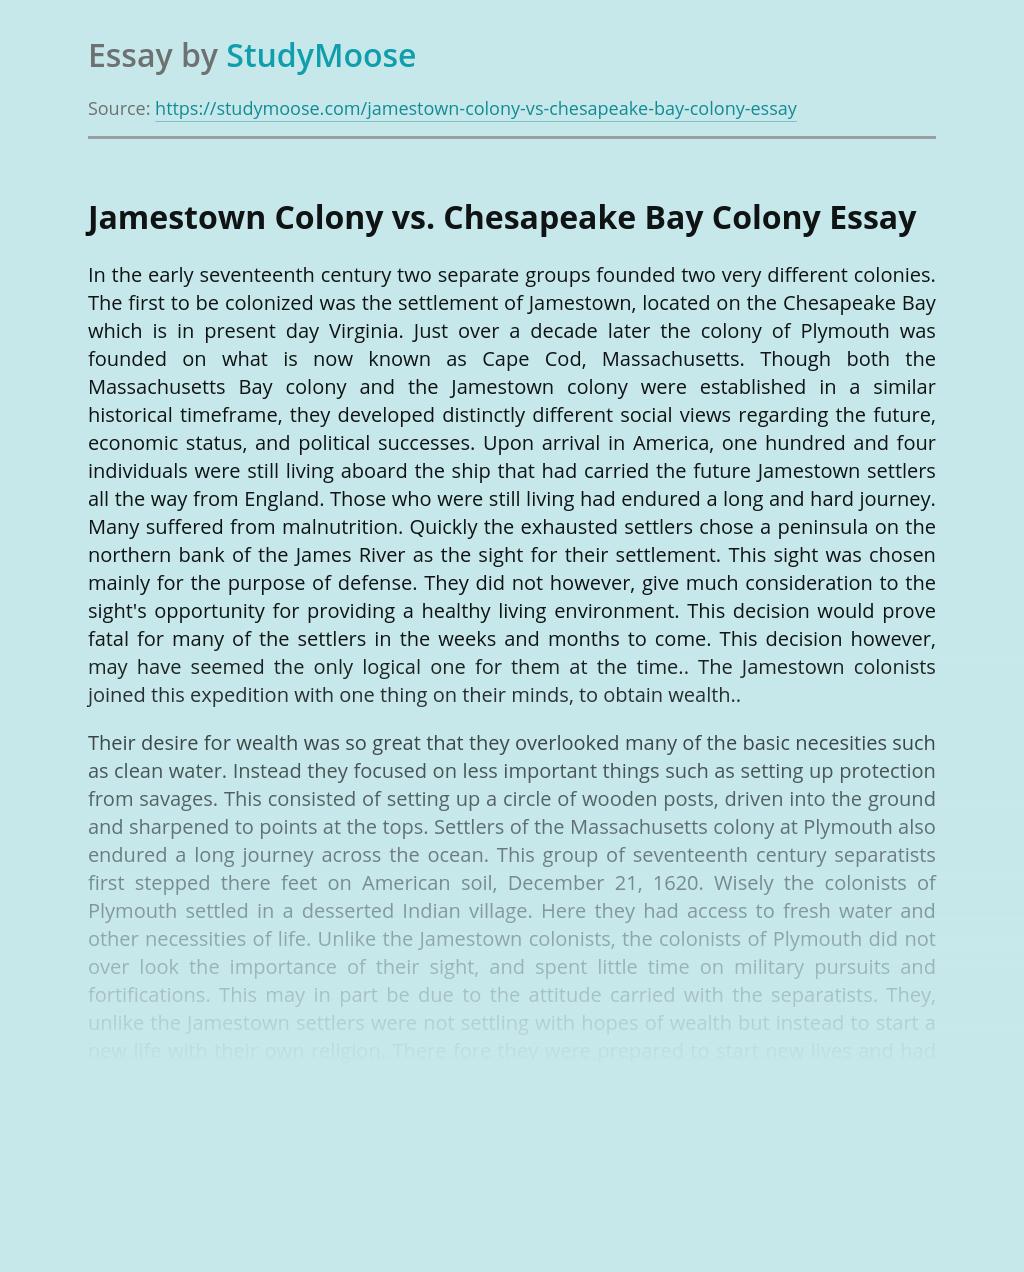 Jamestown Colony vs. Chesapeake Bay Colony